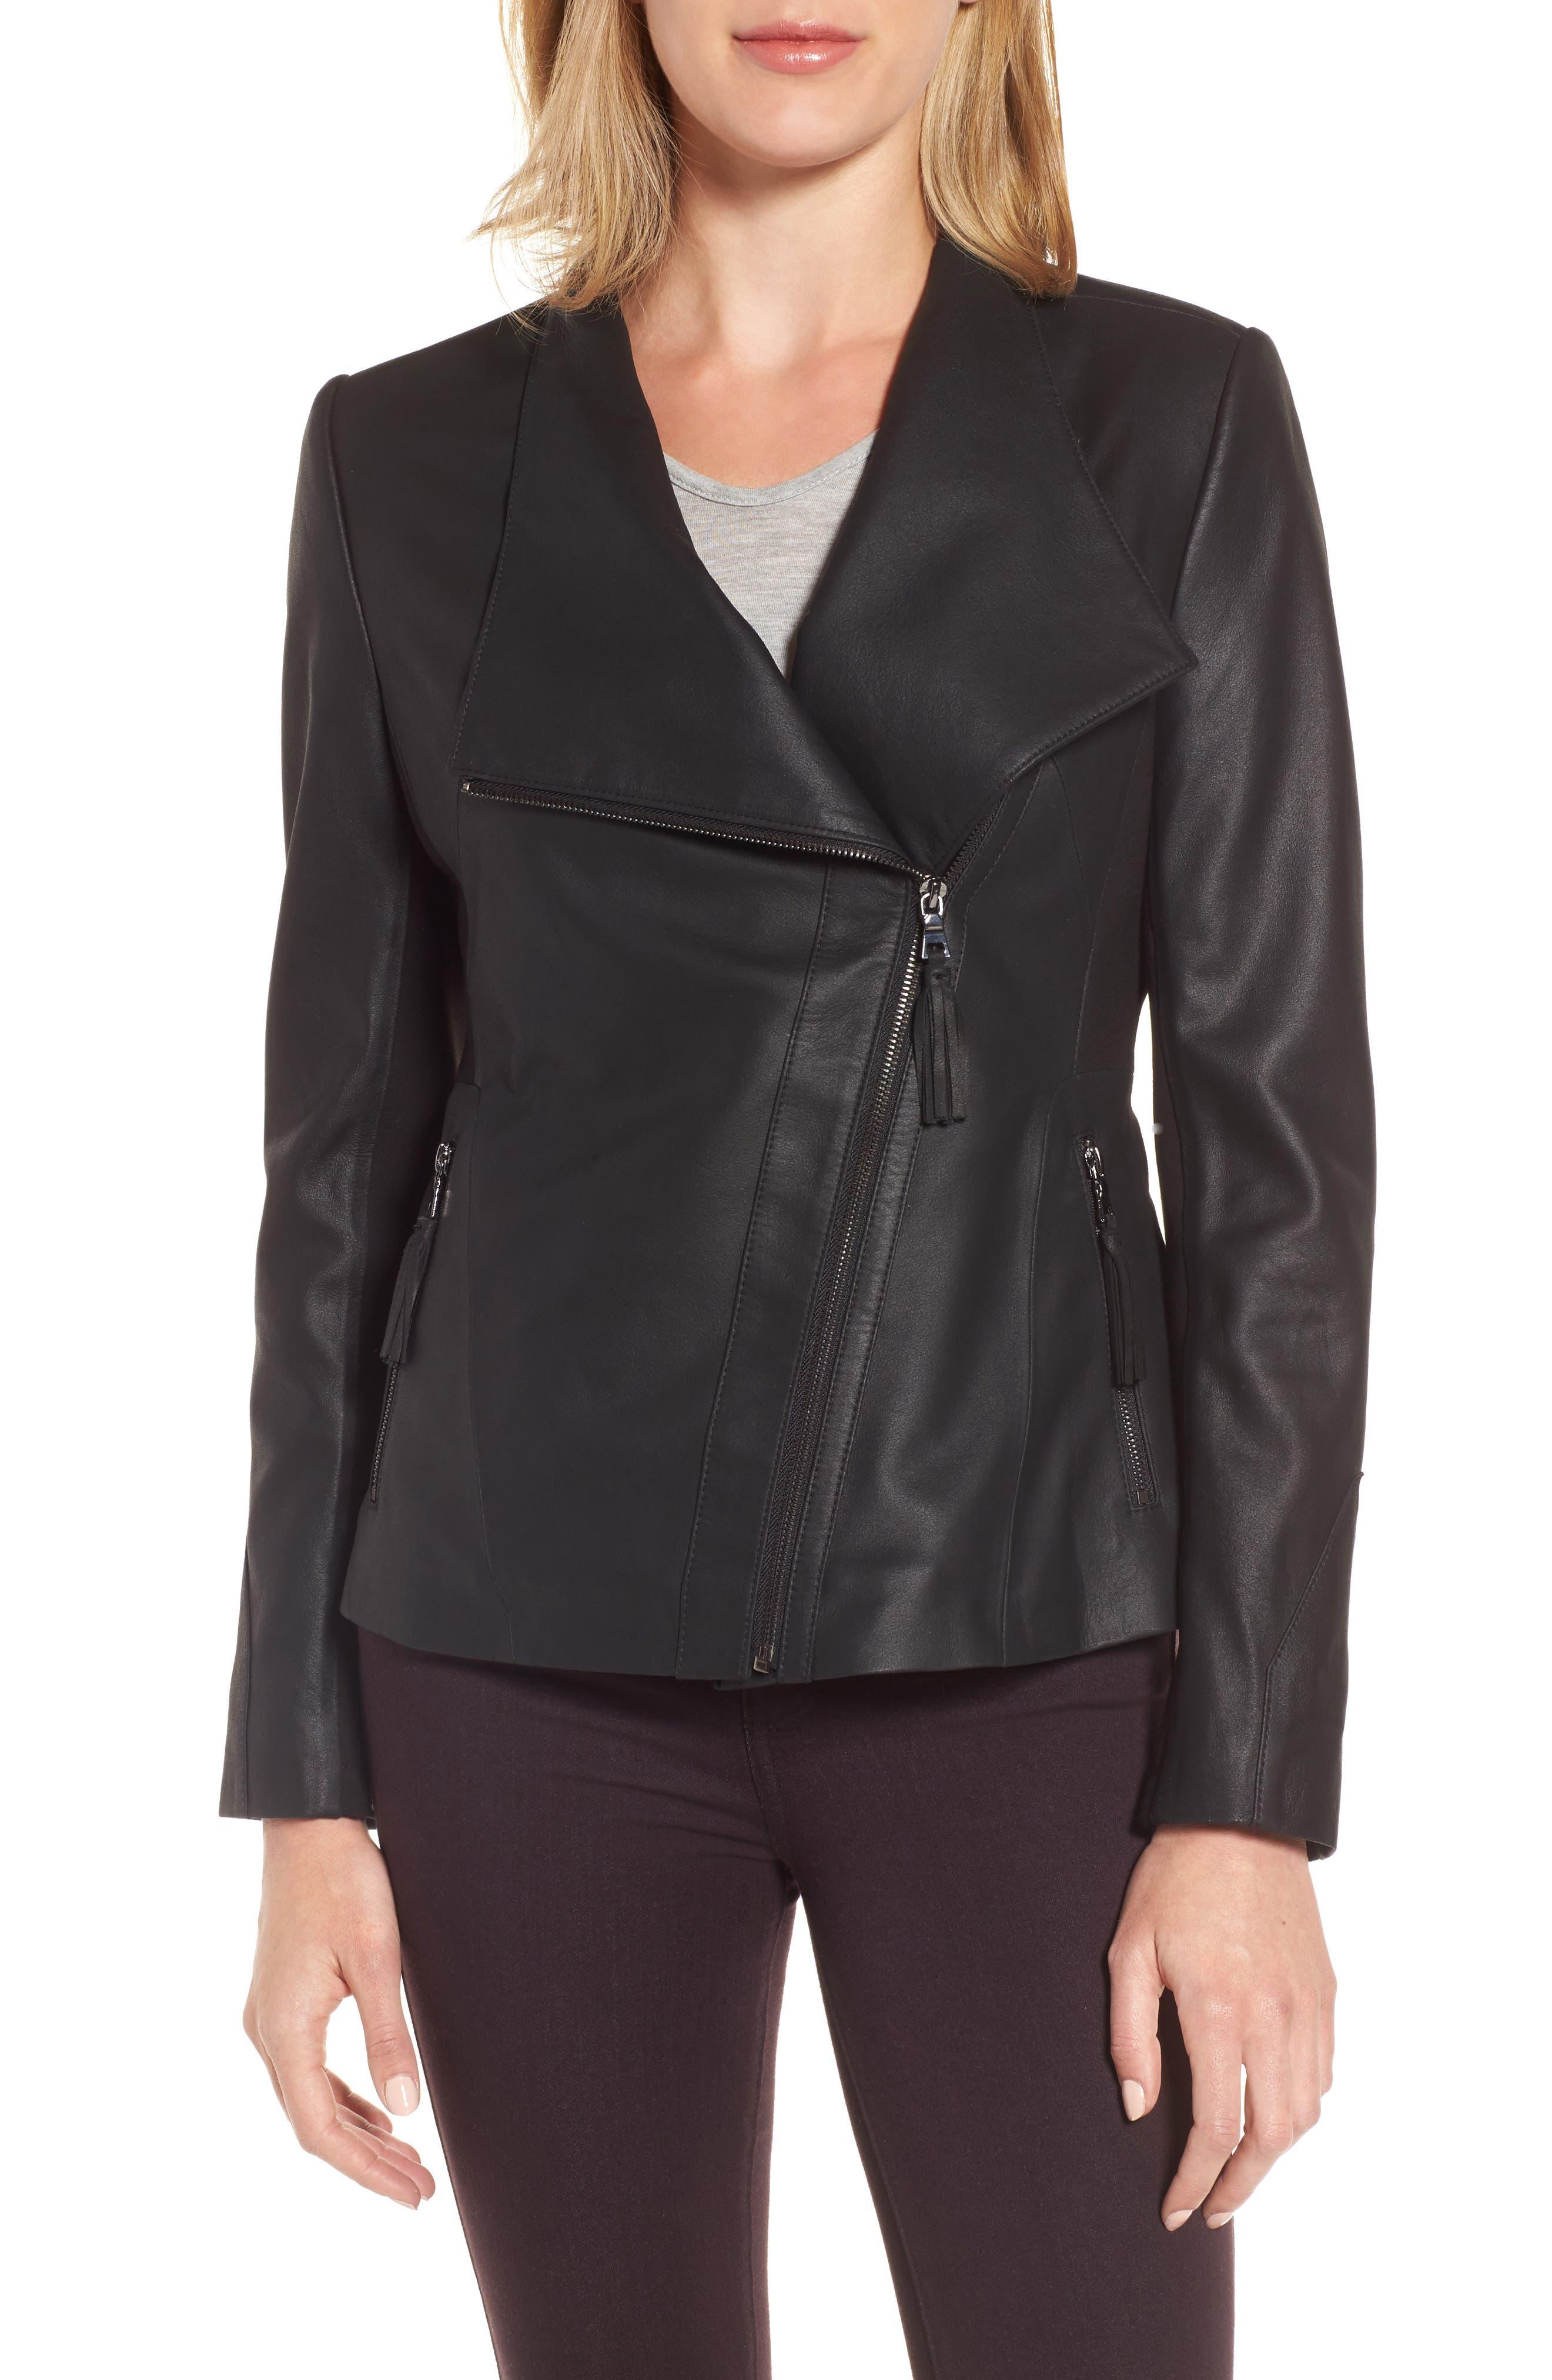 Main Image - Via Spiga Asymmetrical Leather Jacket